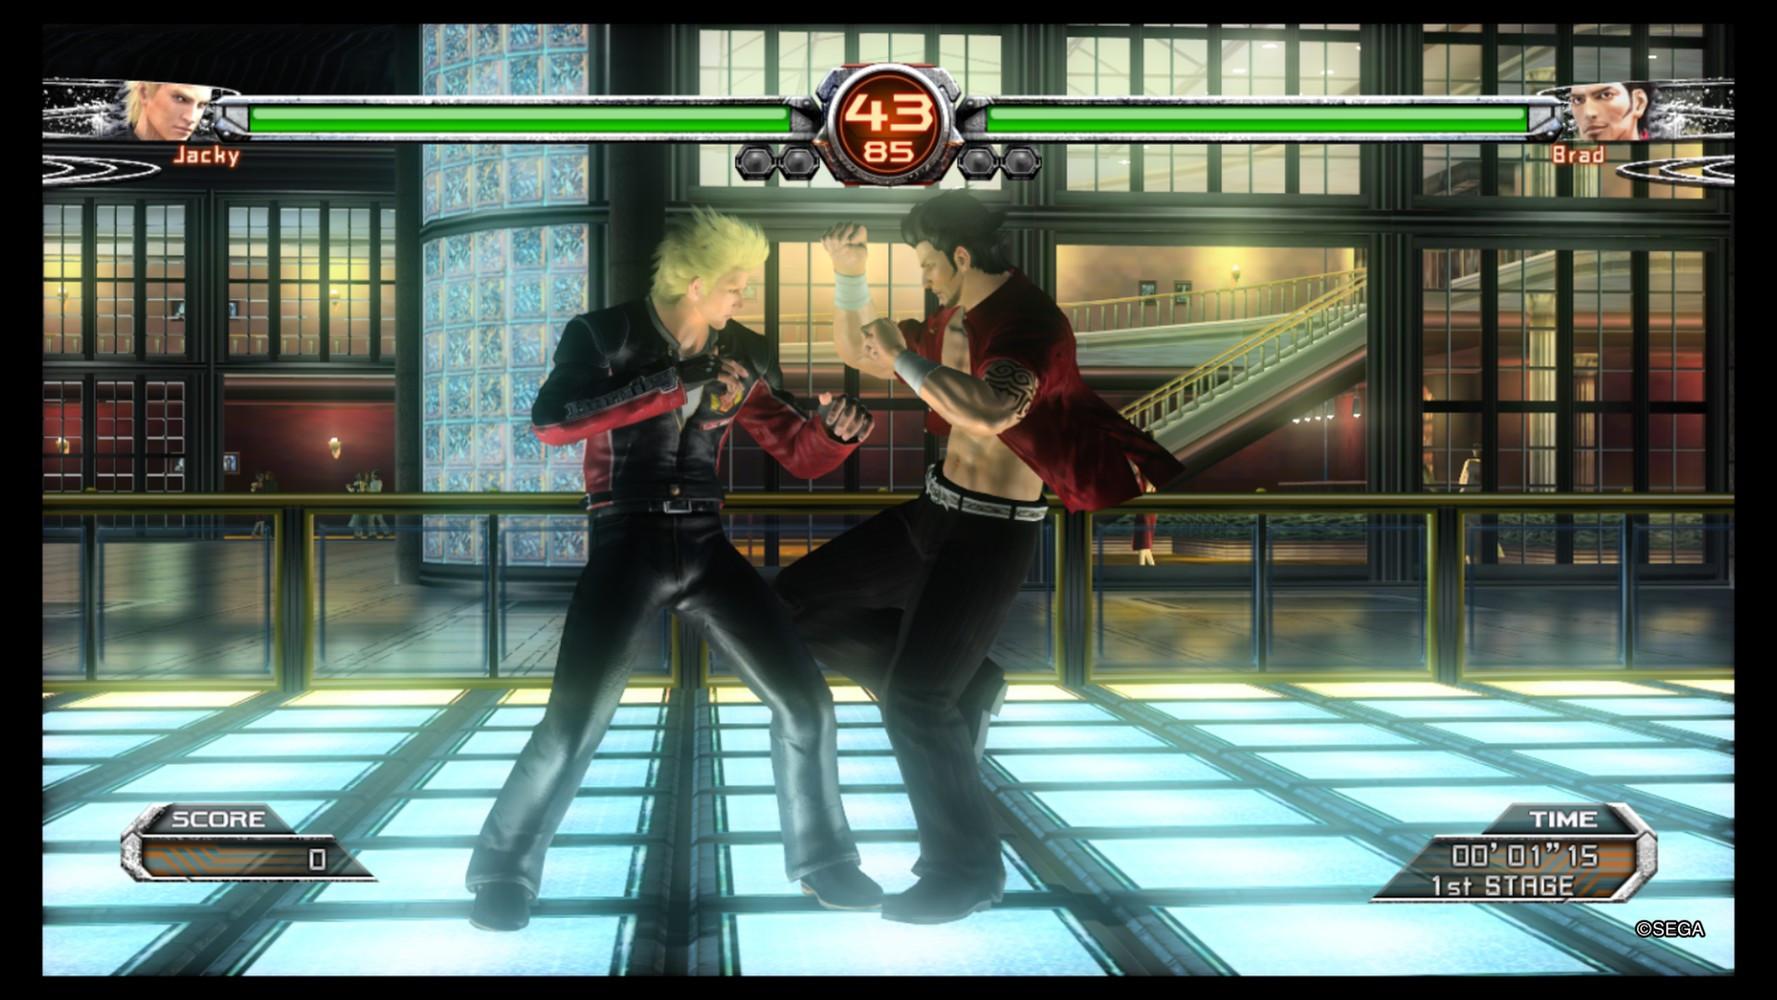 giapponese giochi di incontri PSP inglese